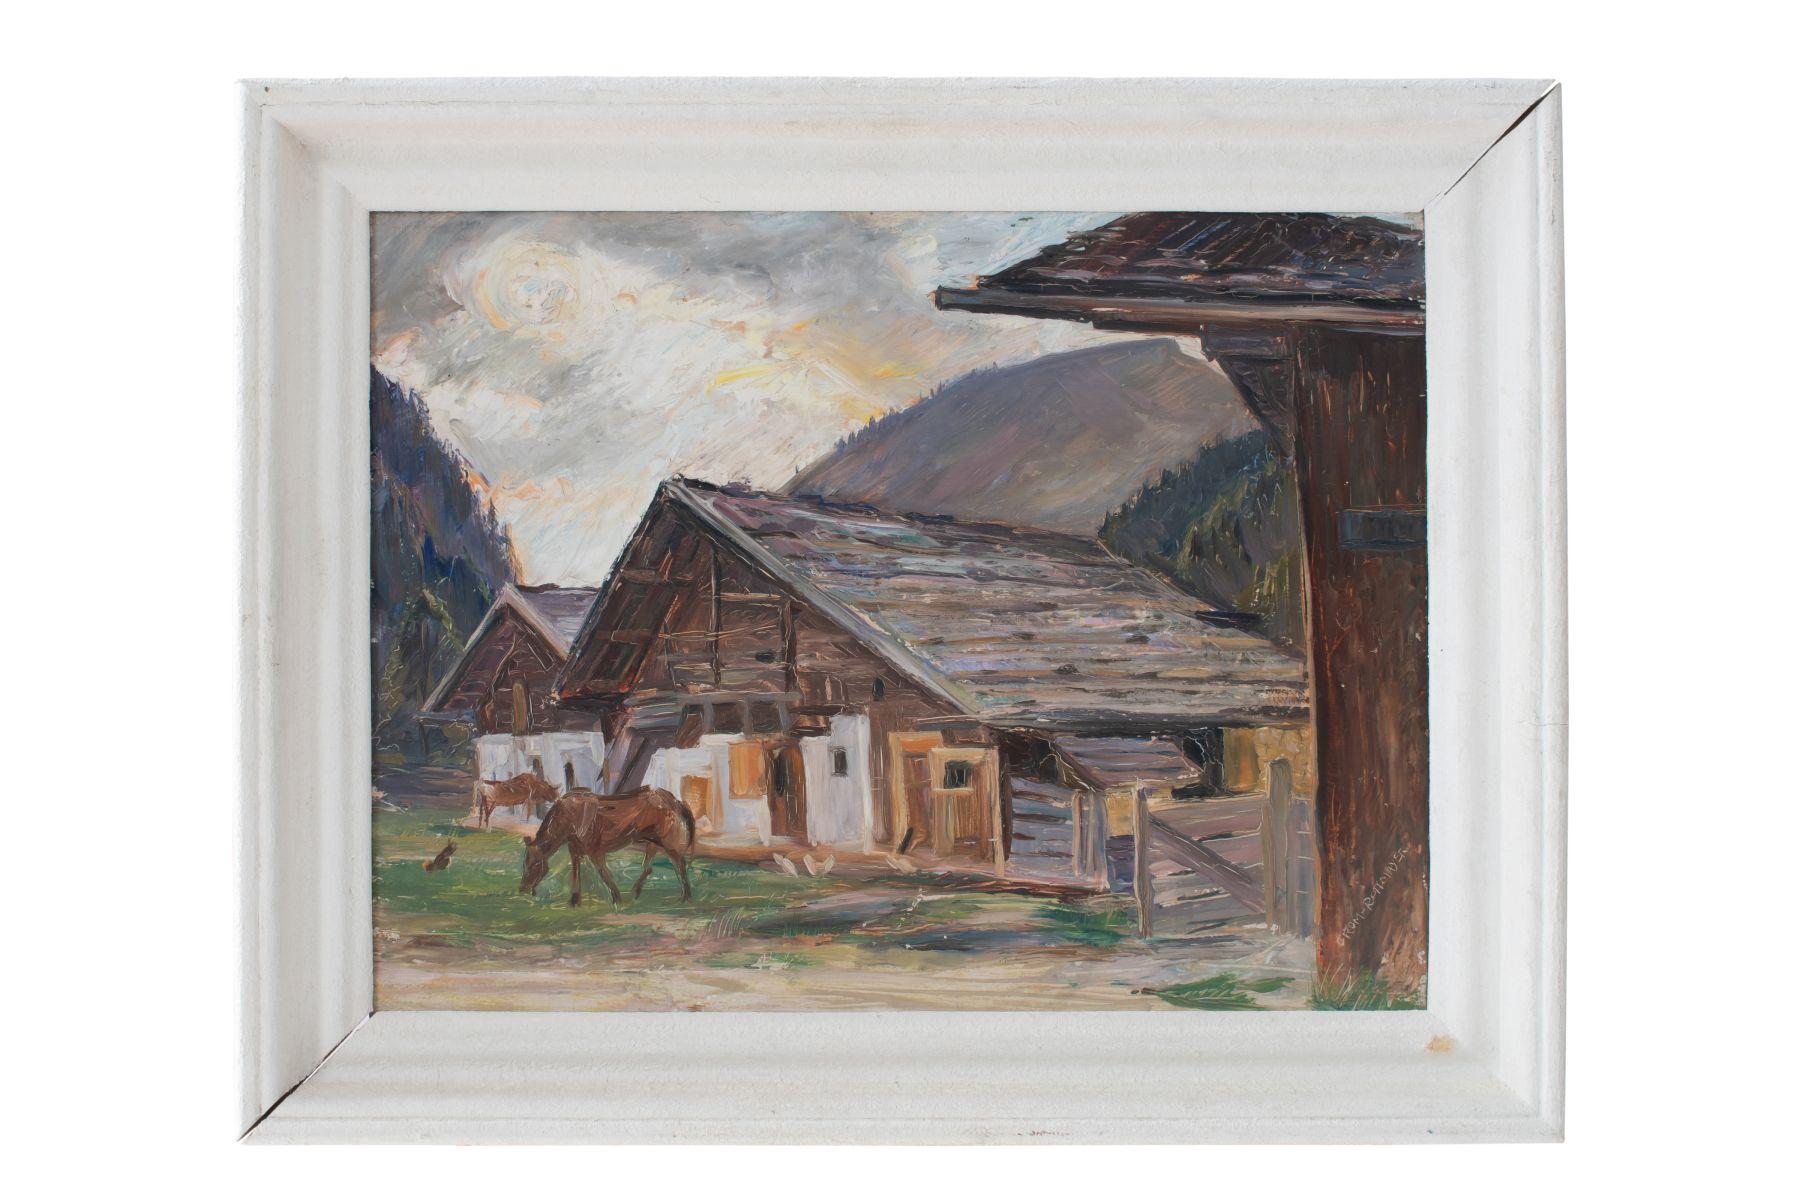 "#99 Hermann Grohm-Rottmayer (1877-1953) ""Farmstead"" | Hermann Grohm-Rottmayer (1877-1953) ""Bauerngehöft"" Image"